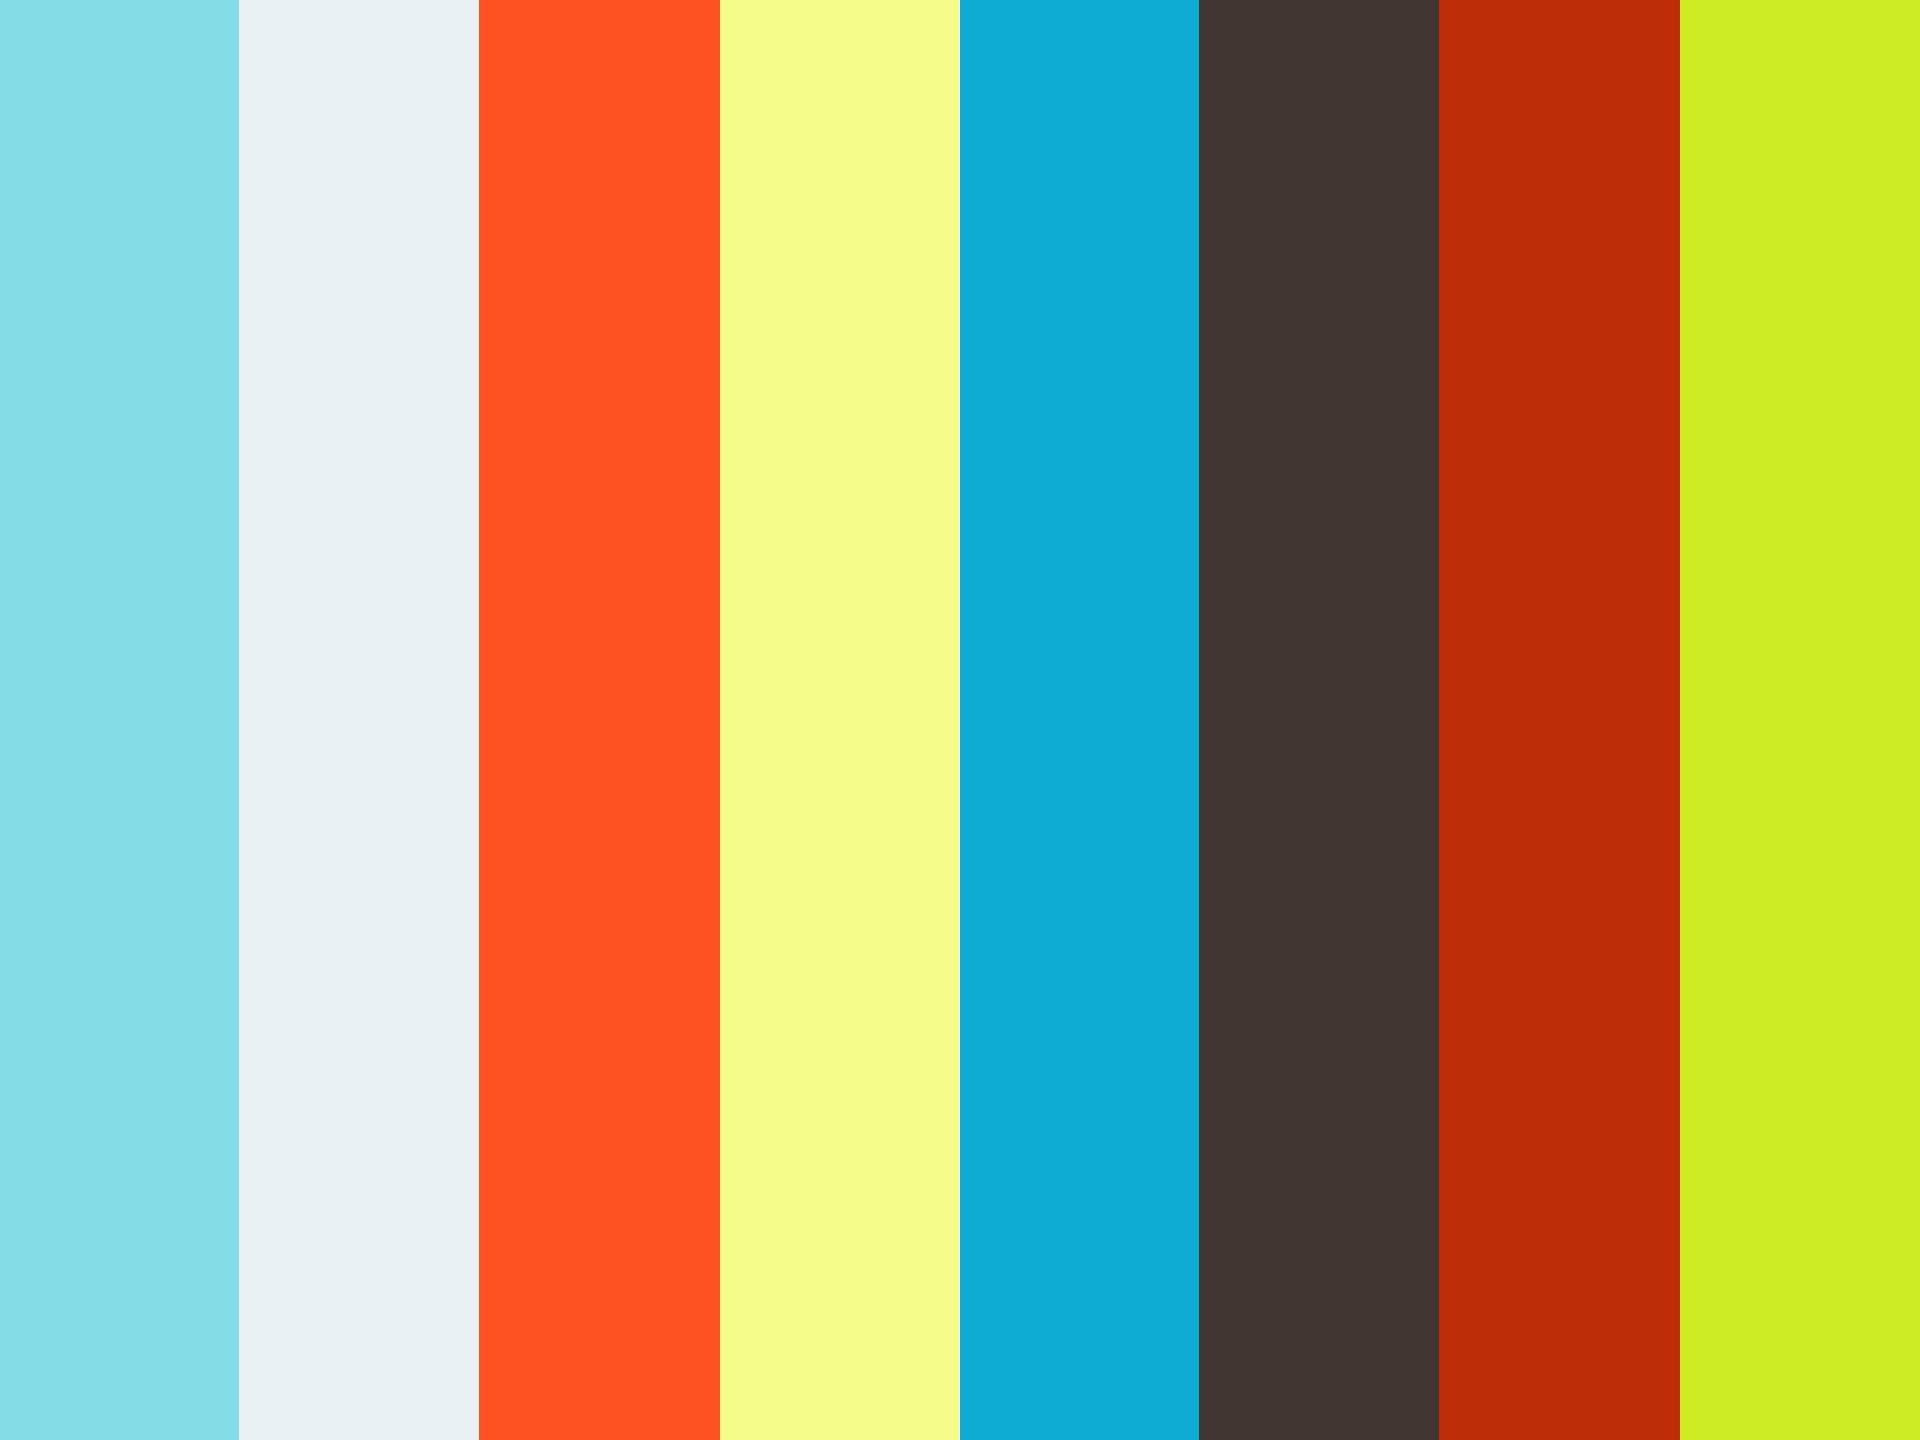 【Proflab】外木 守雄 主任教授 金子 忠良 教授:日本大学歯学部 口腔外科学講座